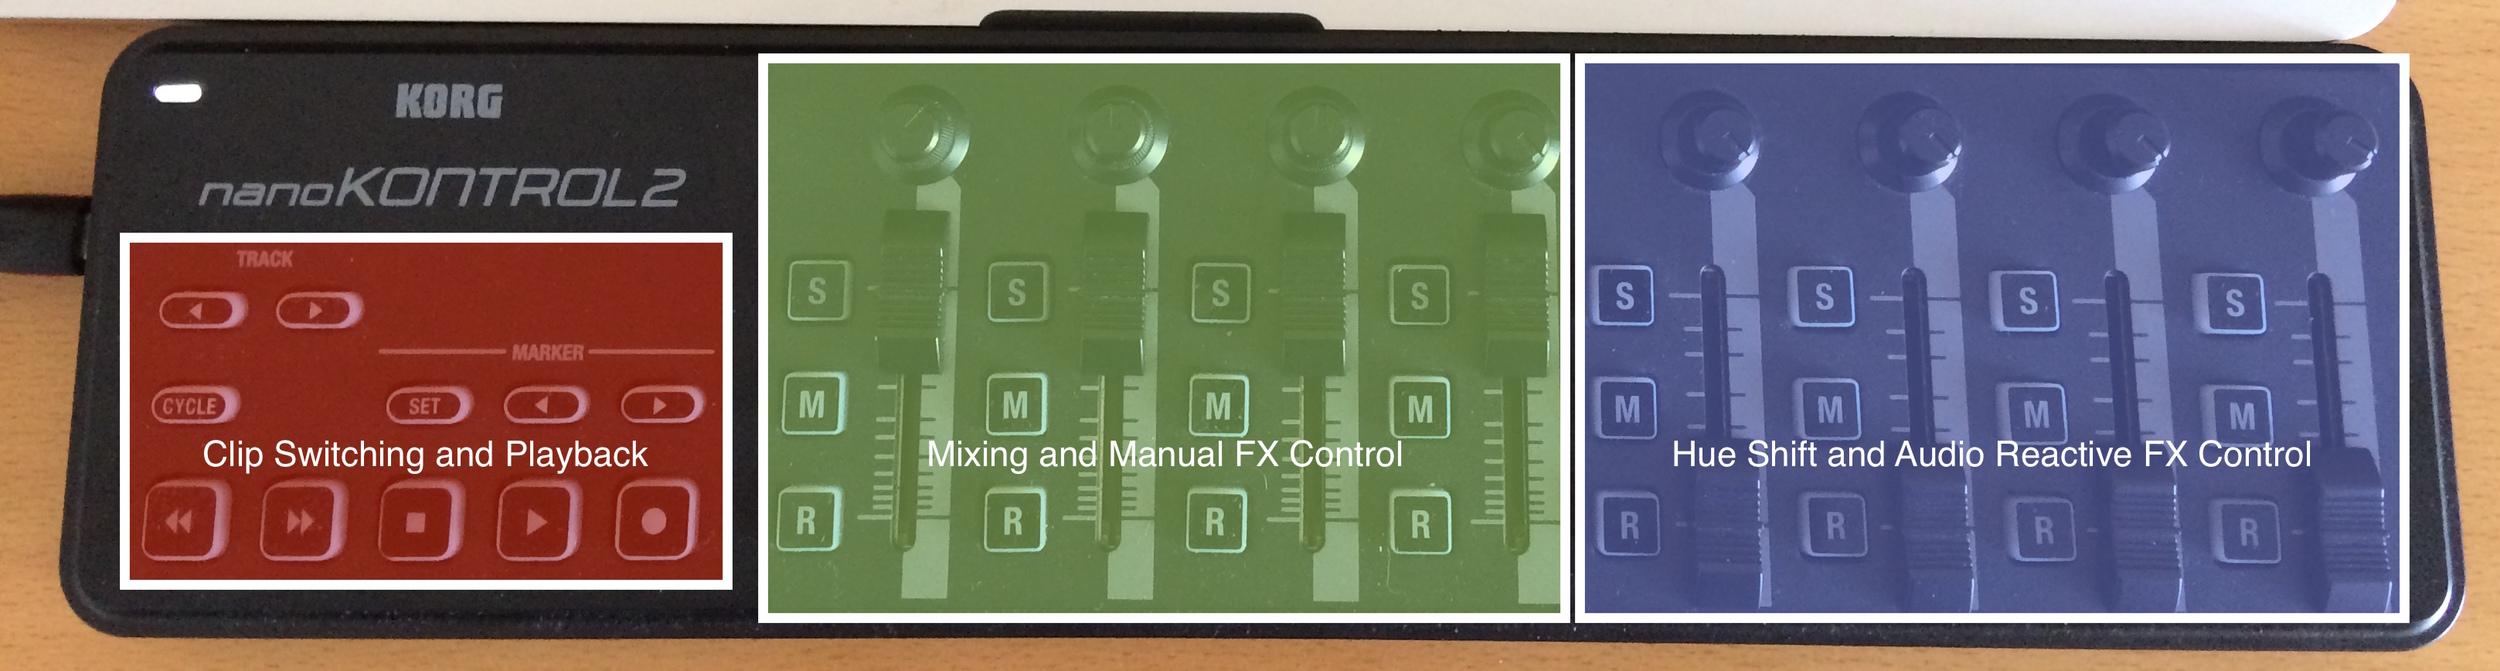 Main controller layout